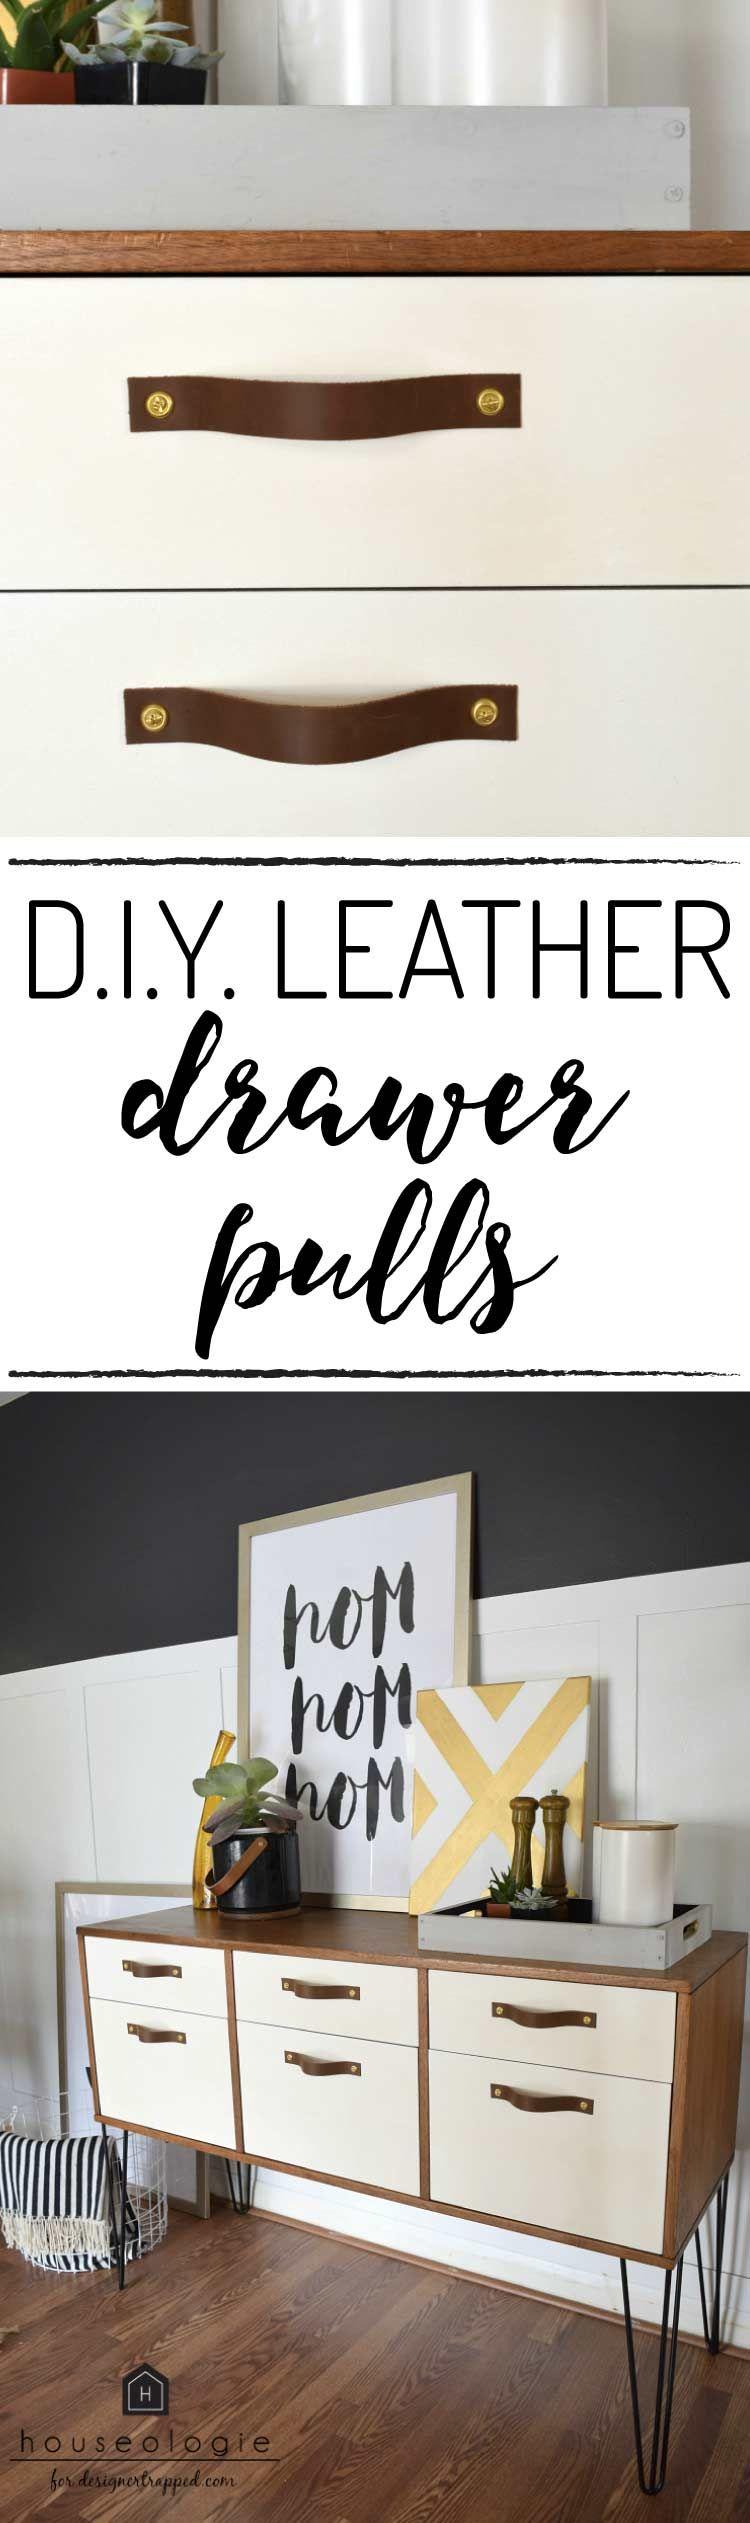 Diy Leather Drawer Pulls Diy Leather Drawer Pulls Leather Drawer Pulls Diy Leather Pulls